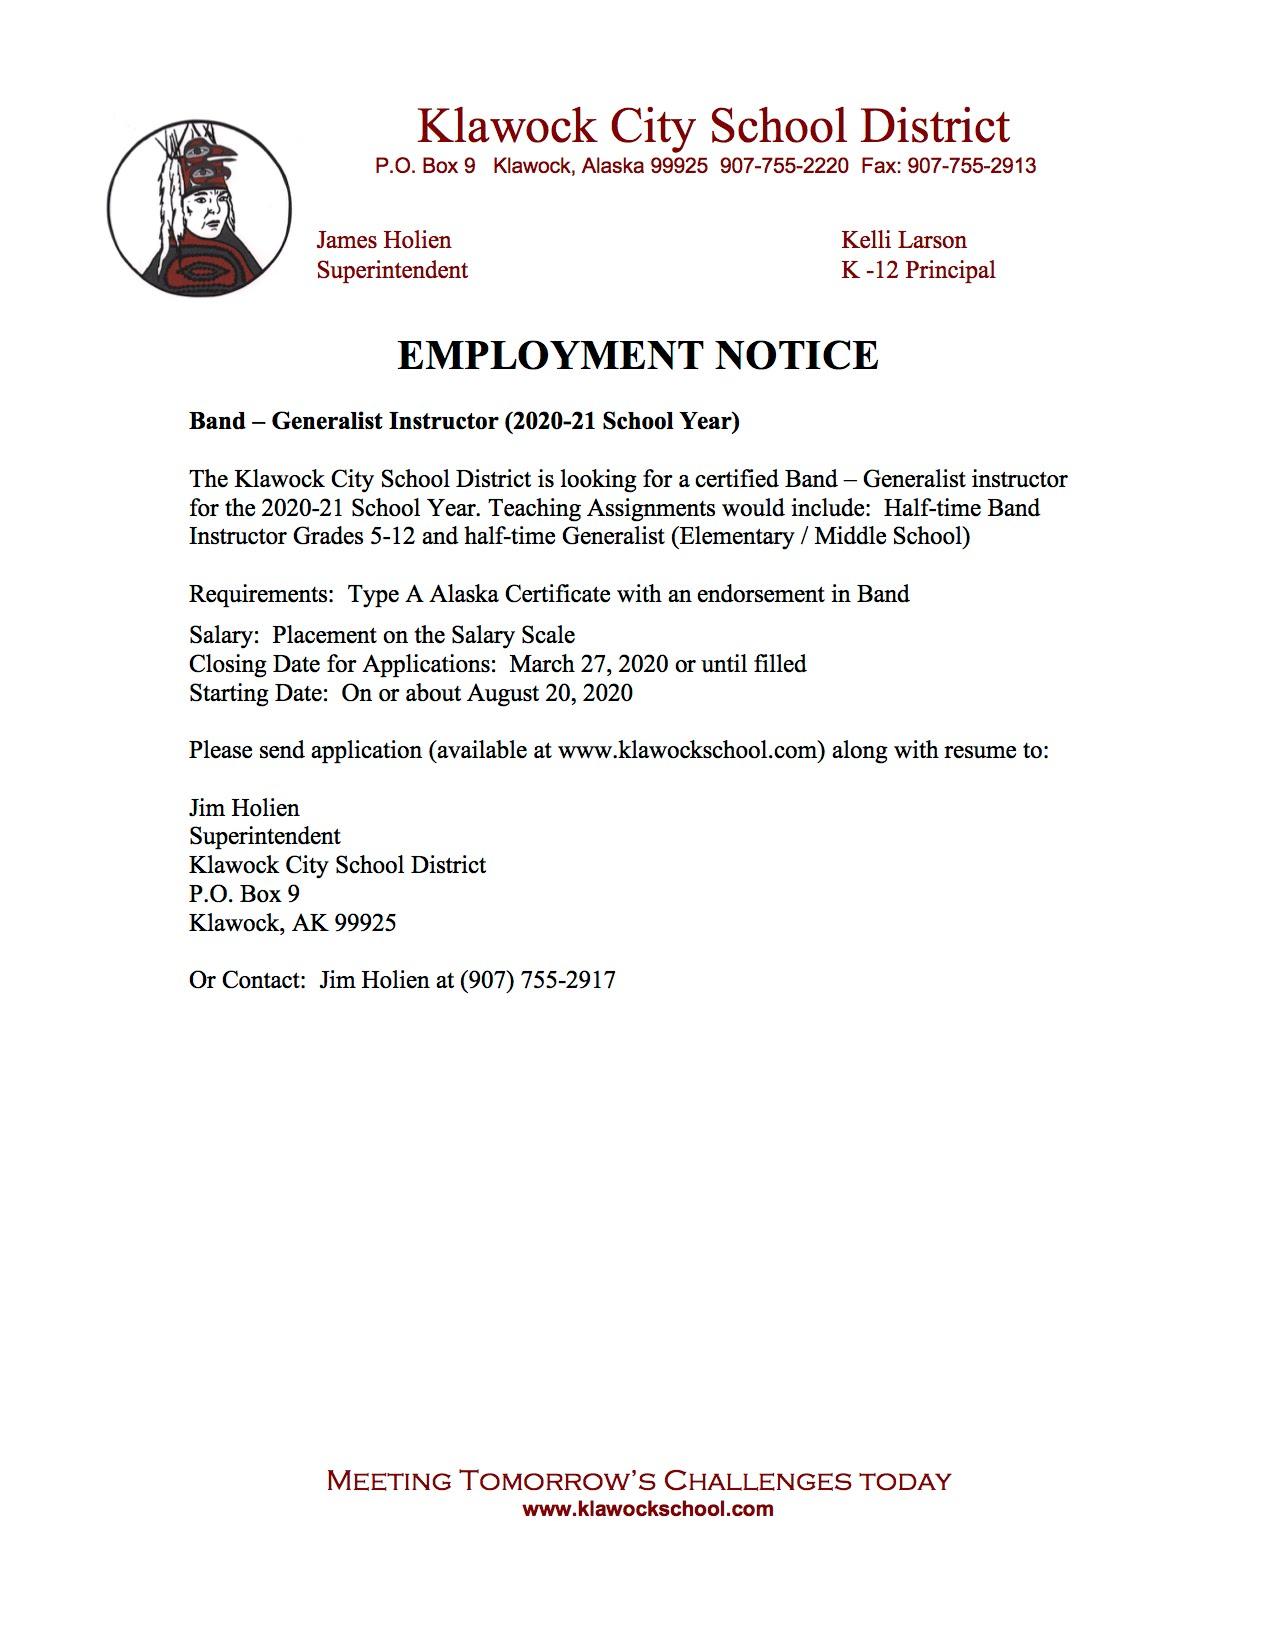 Job Openings/Applications